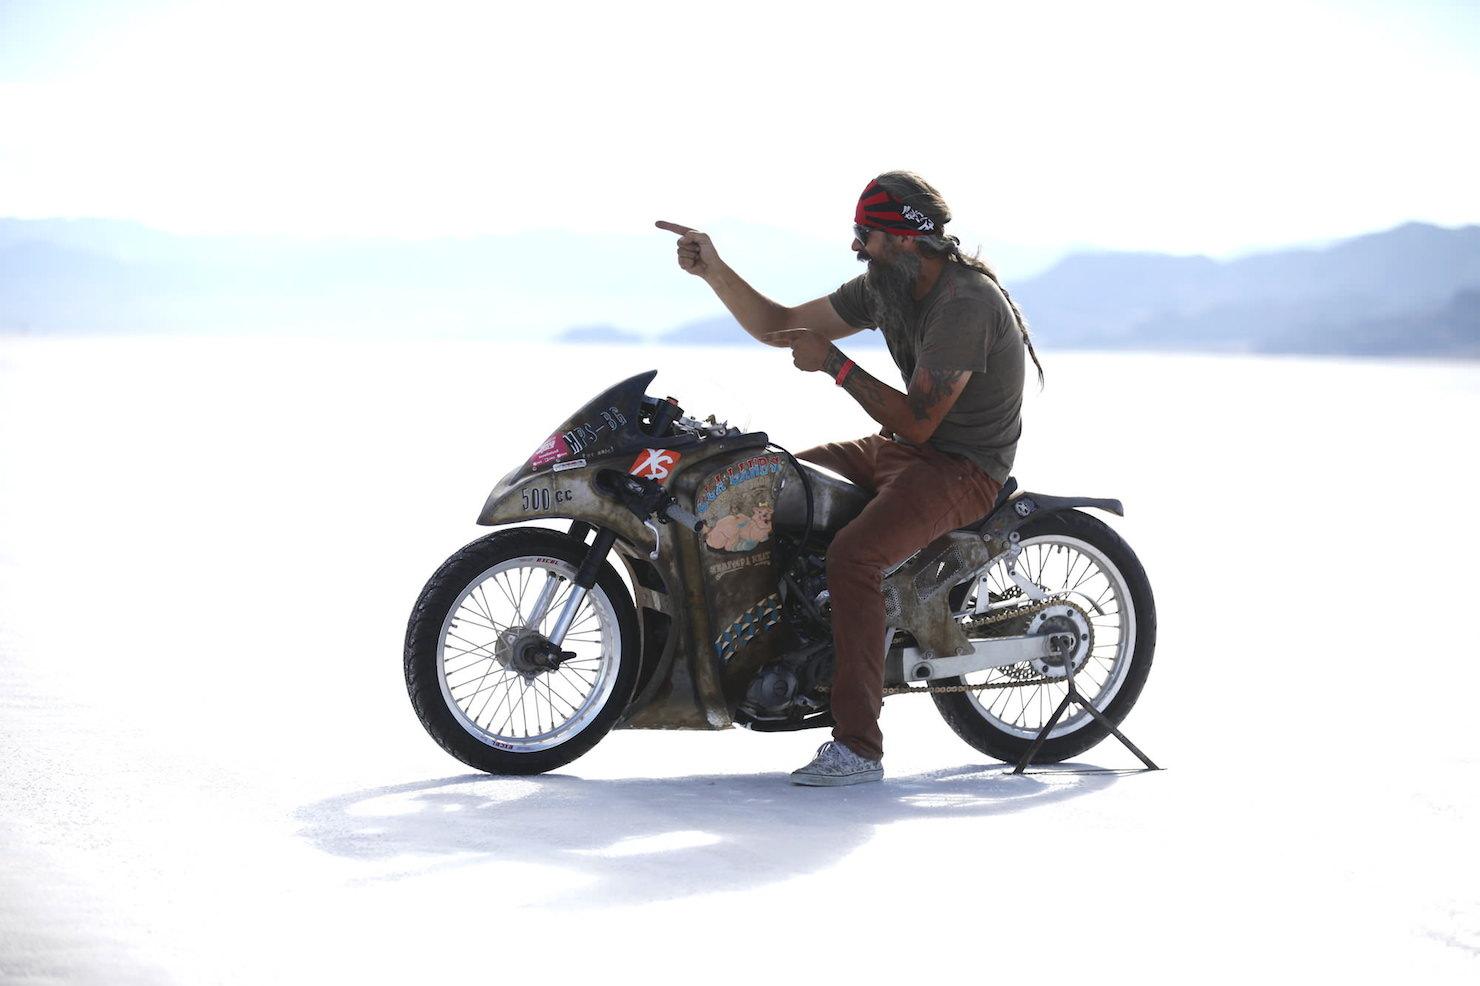 Turbo Yamaha Salt Flat Racer by Super Rat 8